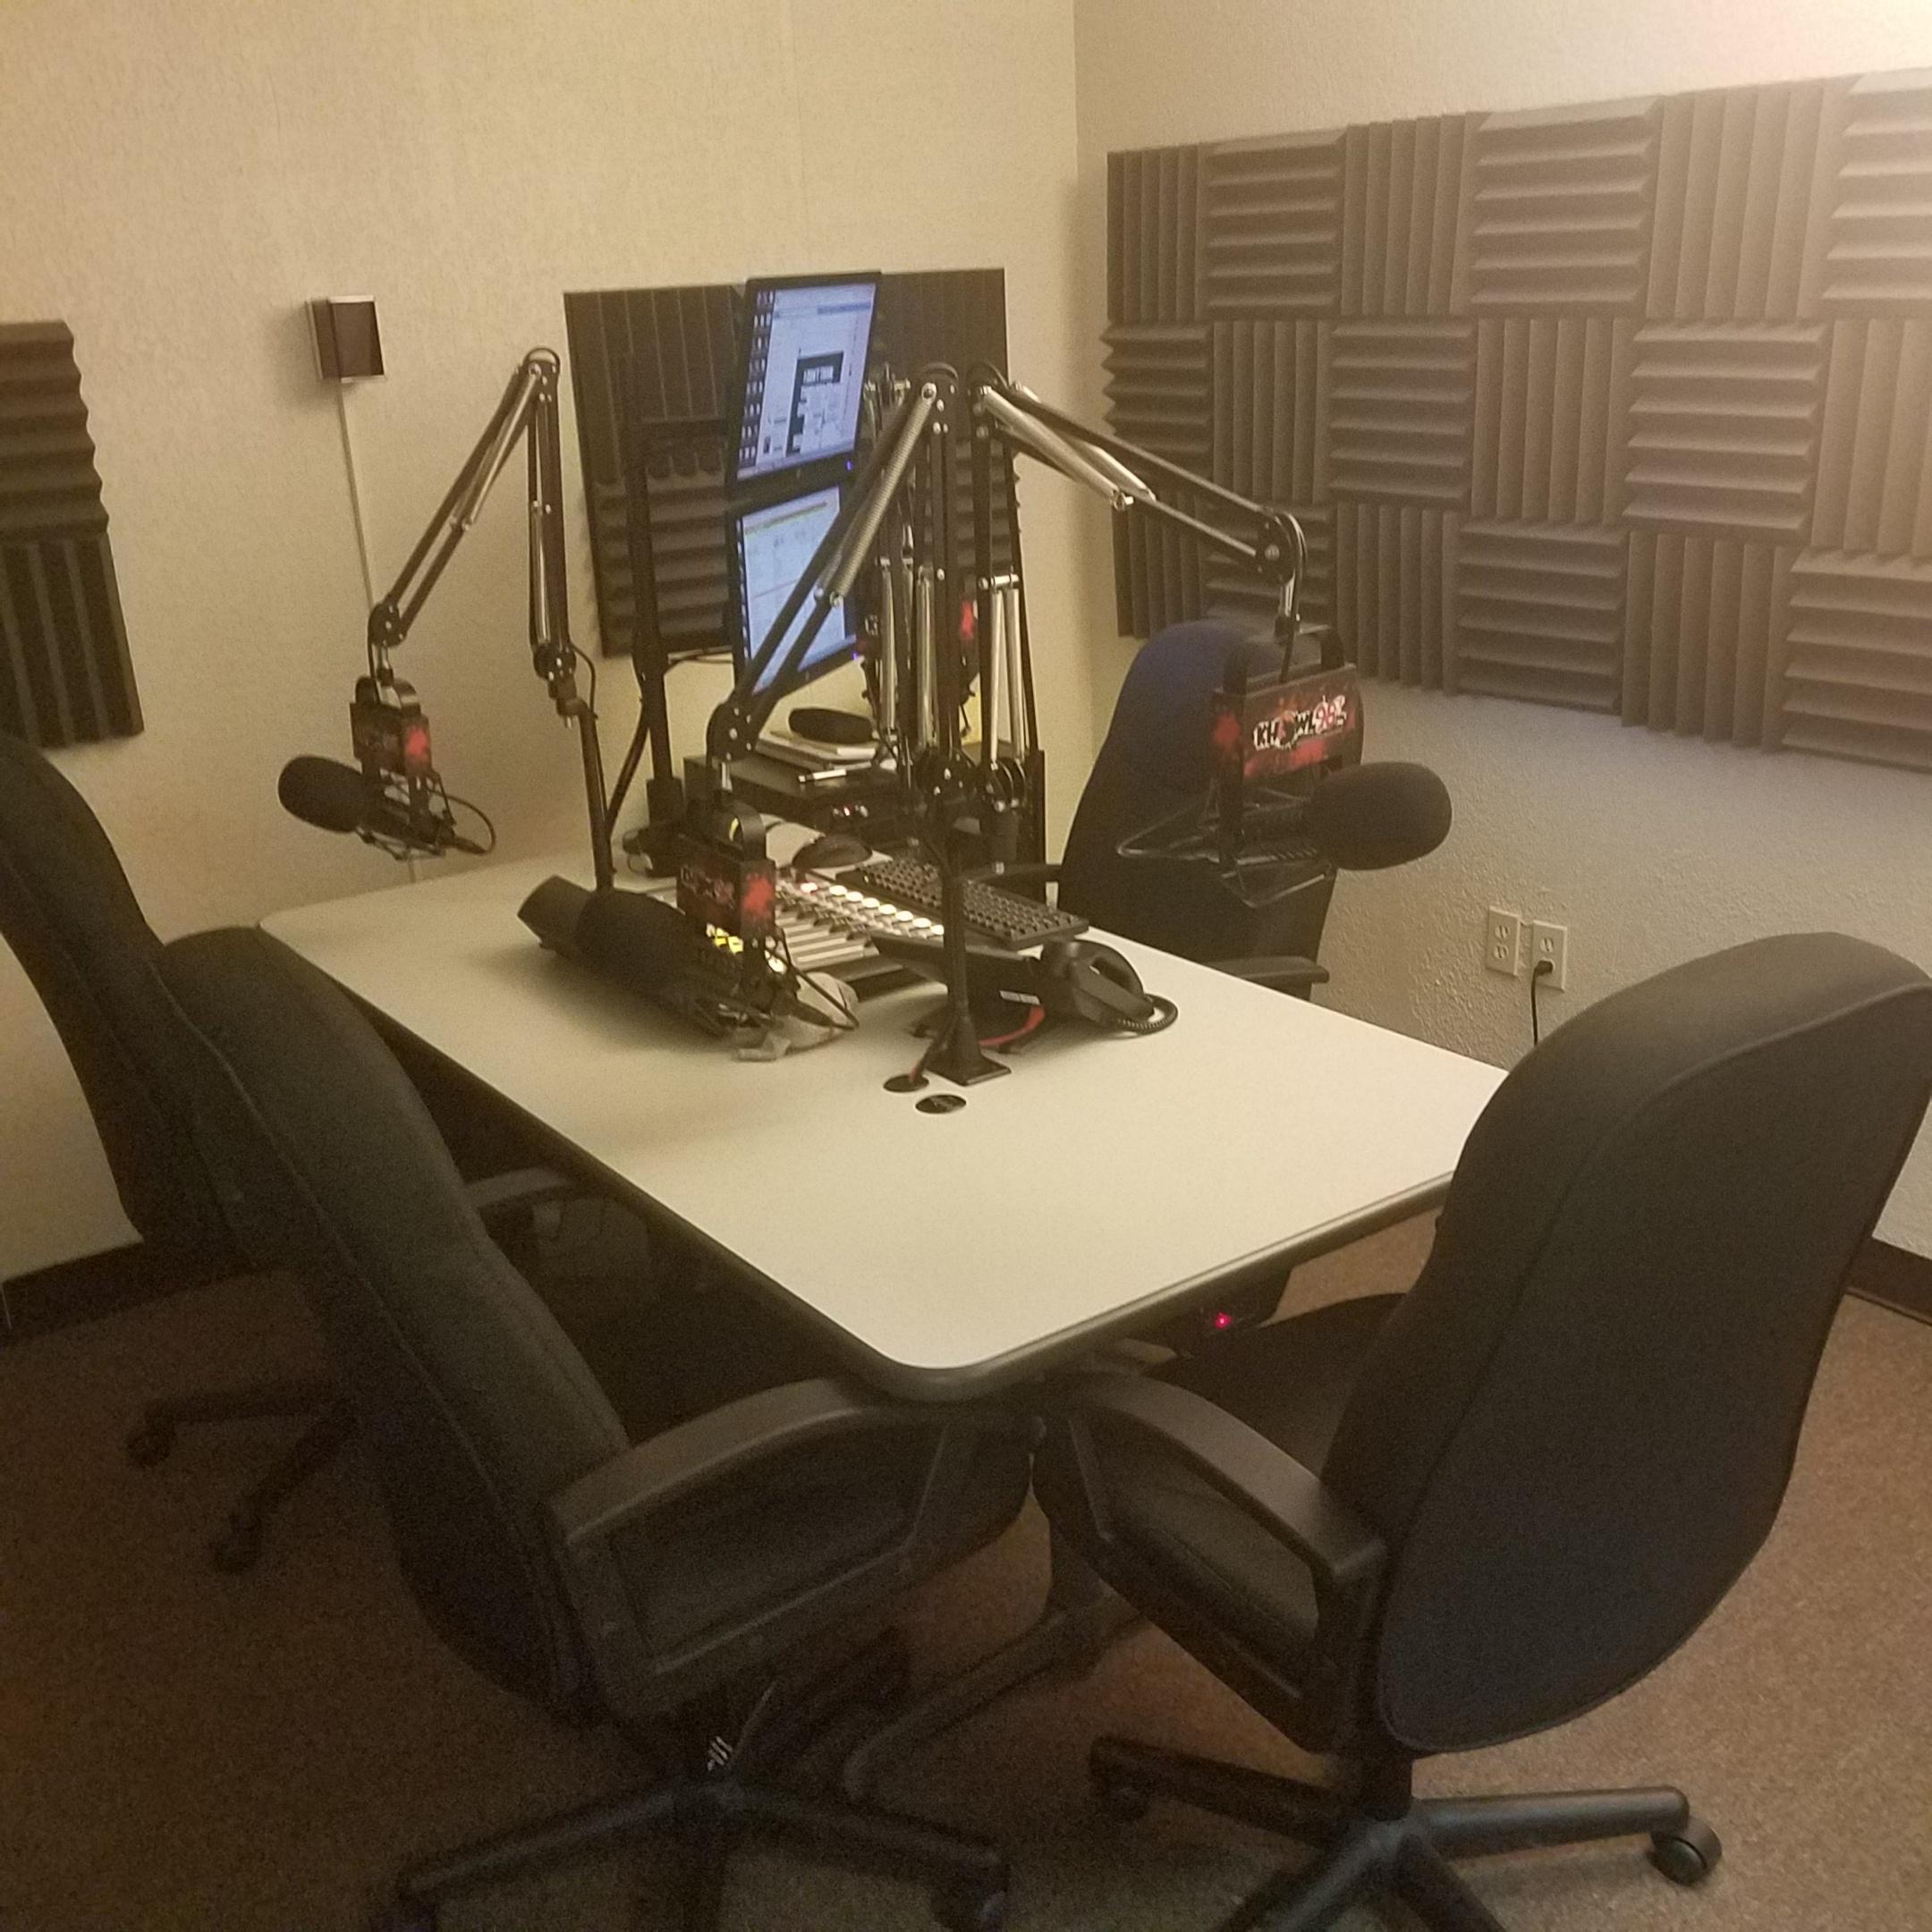 KHOWL auxiliary studio